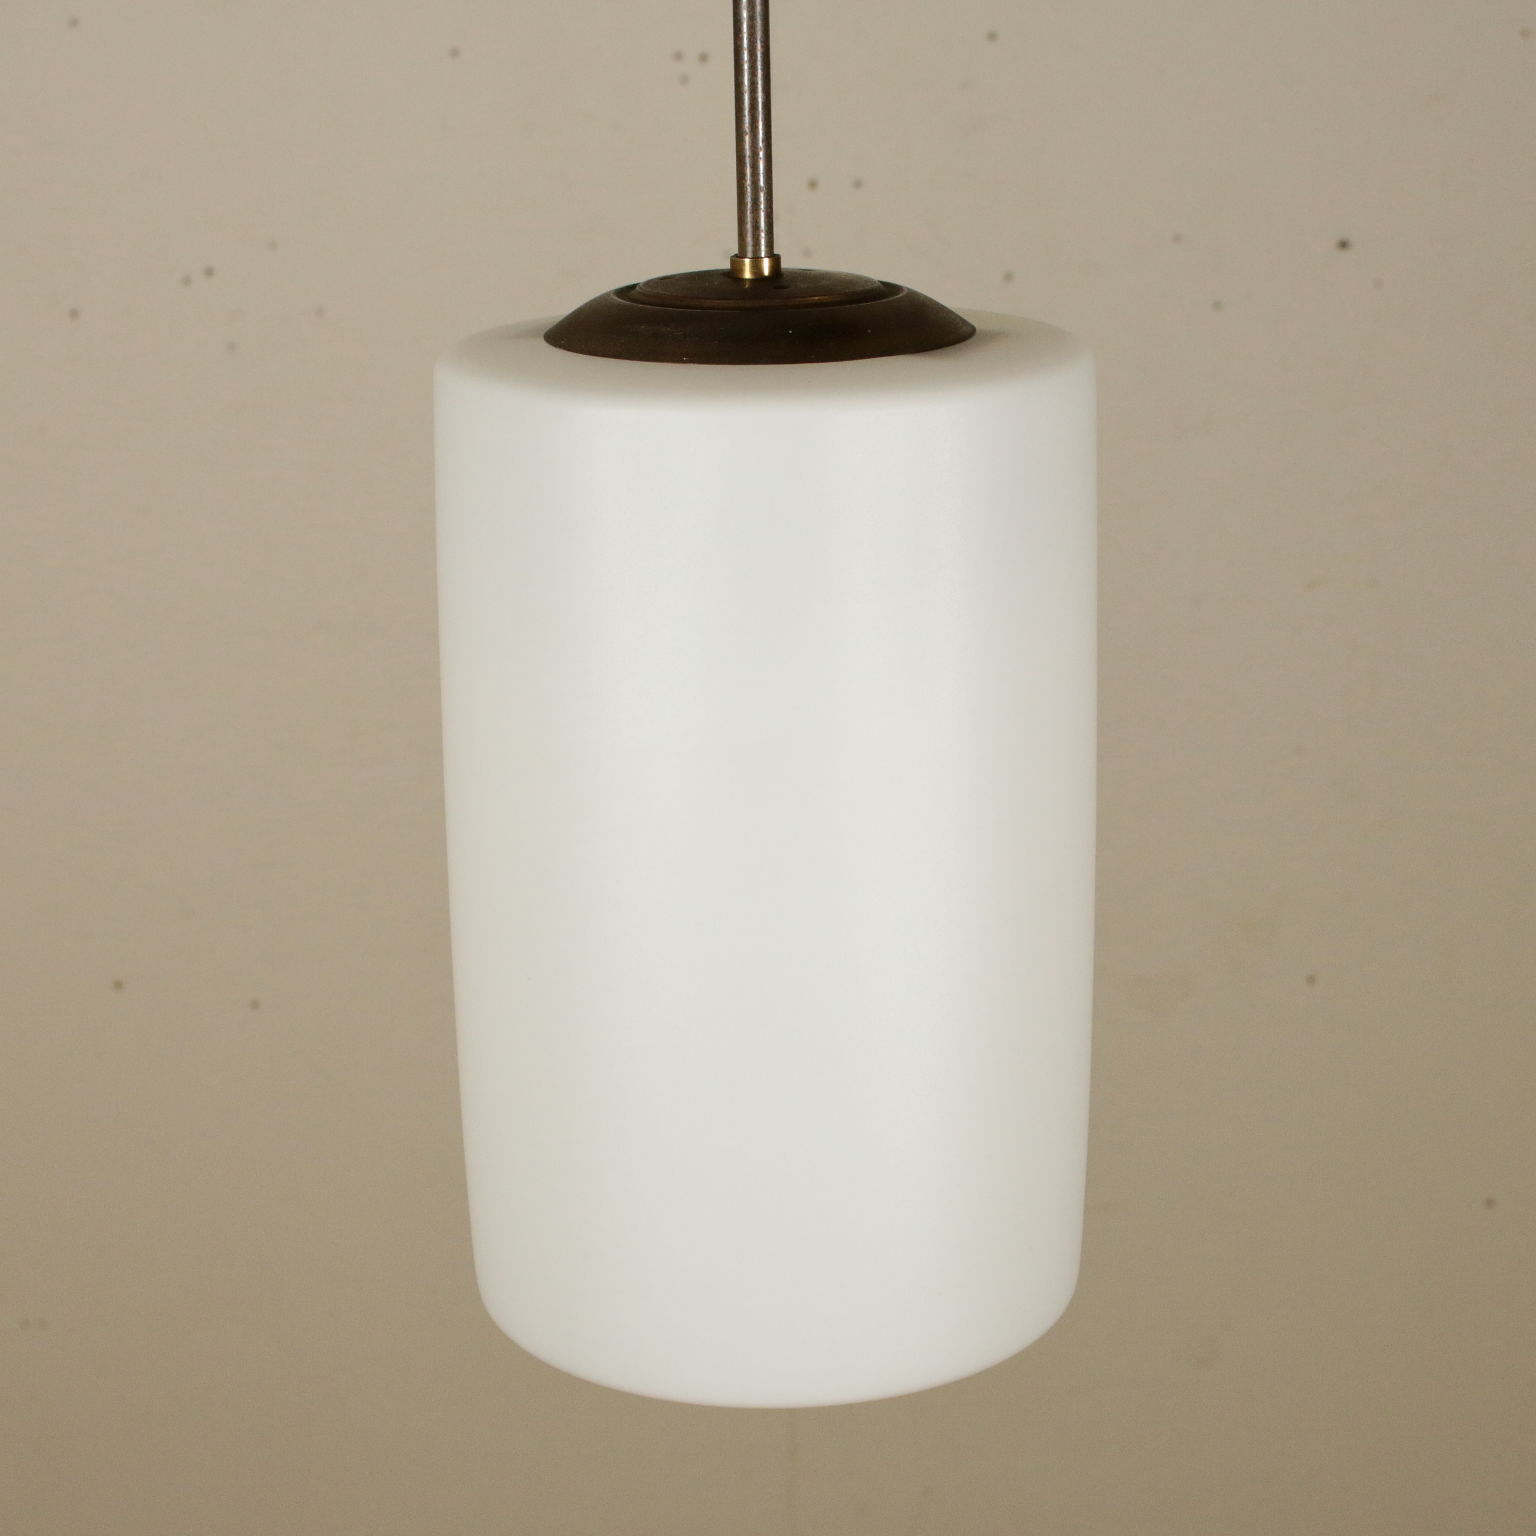 Lampe 60er Jahre Beleuchtung Modernes Design Dimanoinmano It